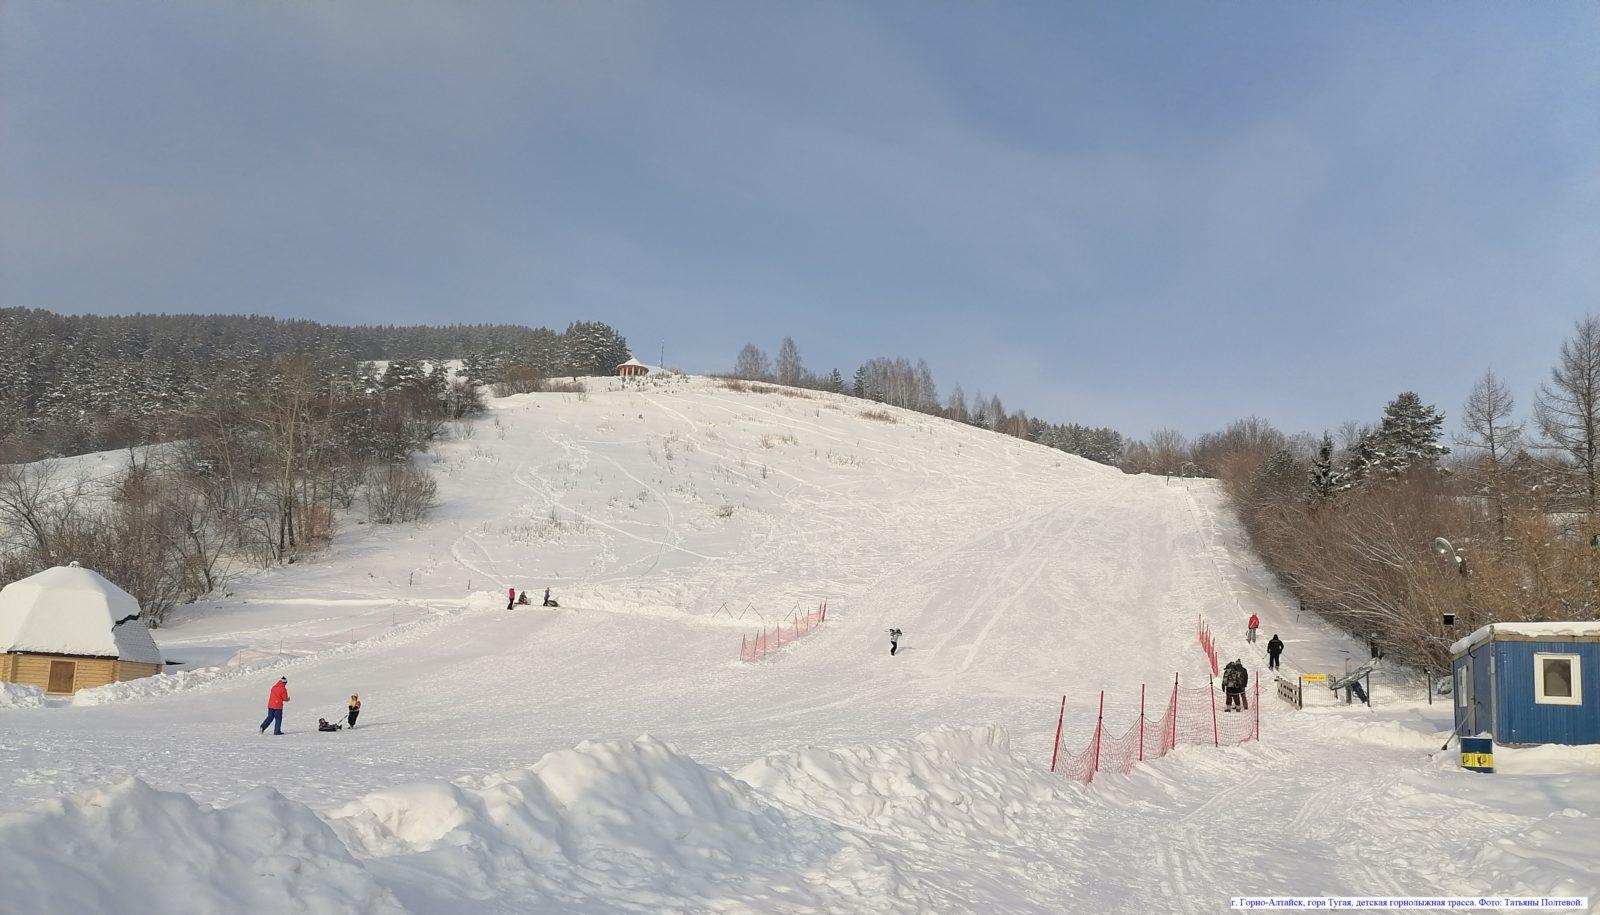 г. Горно-Алтайск, гора Тугая, детская горнолыжная трасса.